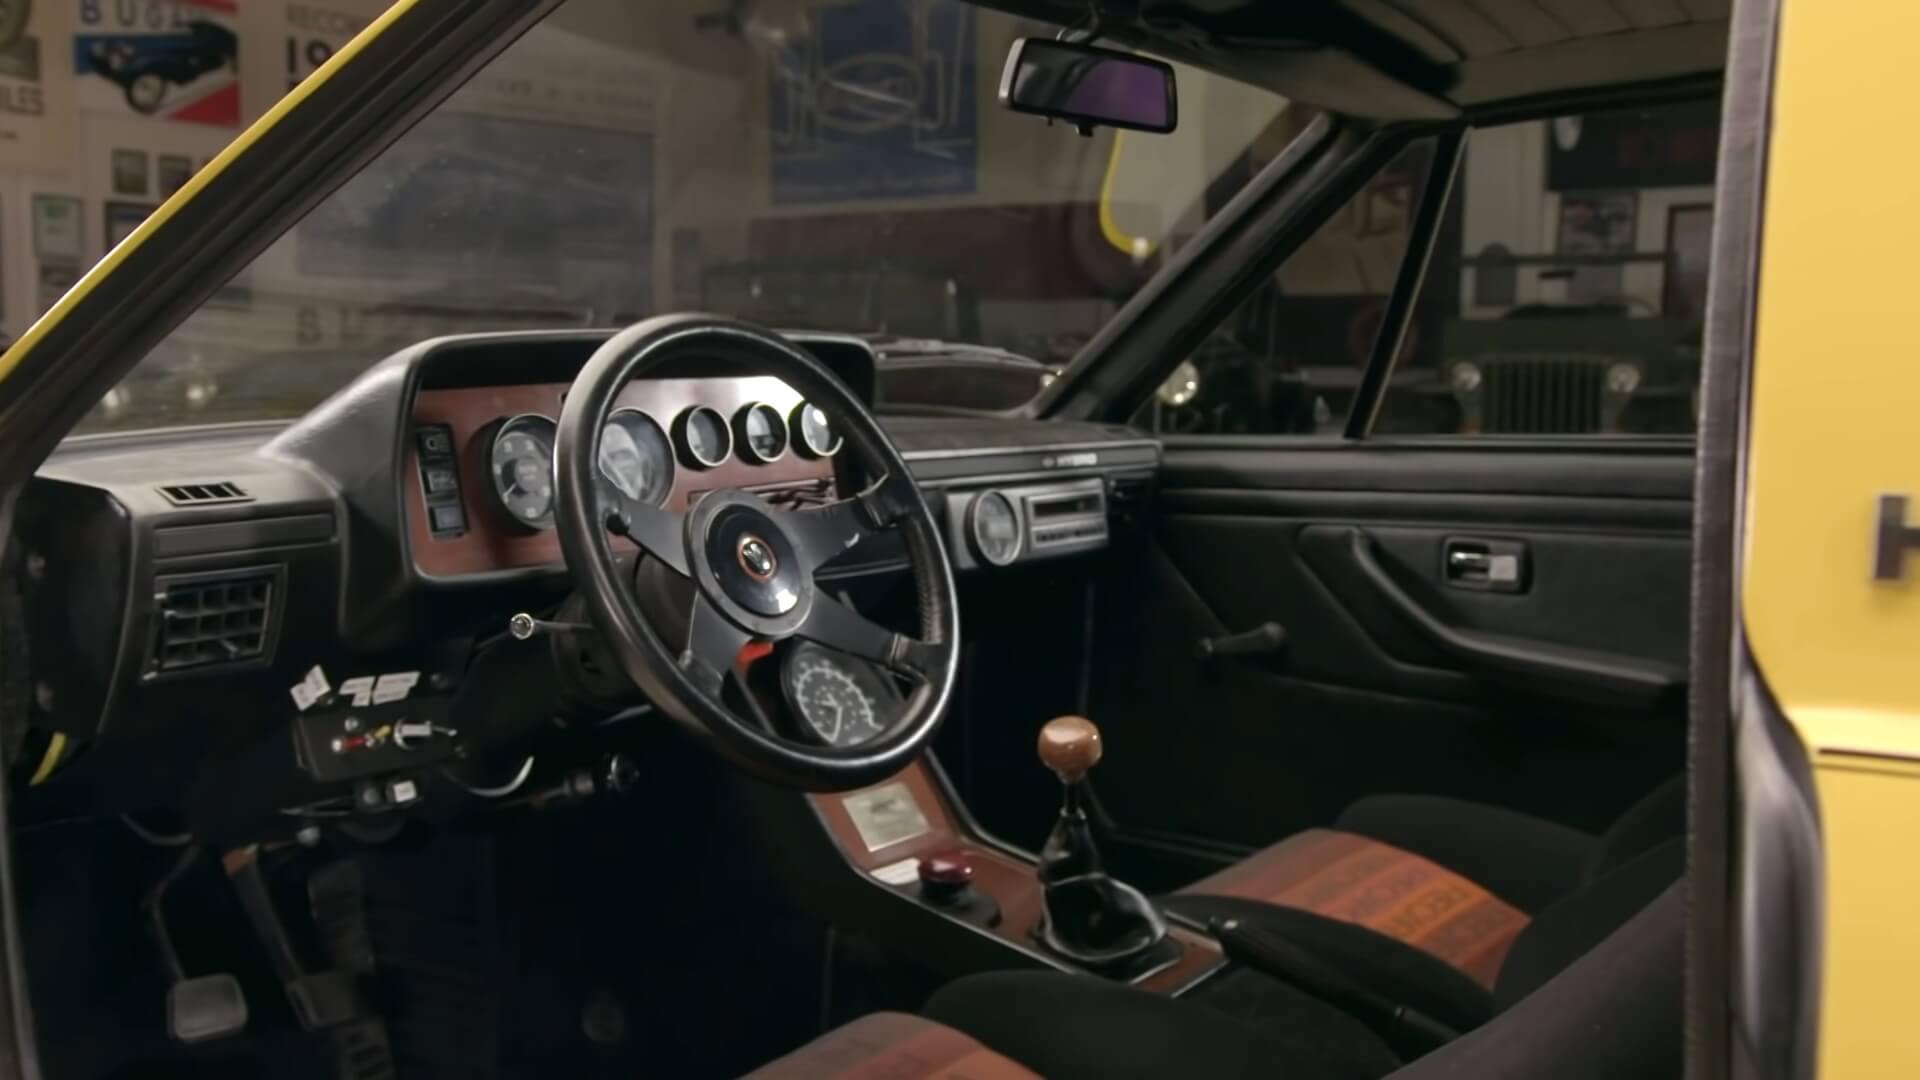 Интерьер концептуального гибрида Briggs & Stratton Hybrid 1980 года